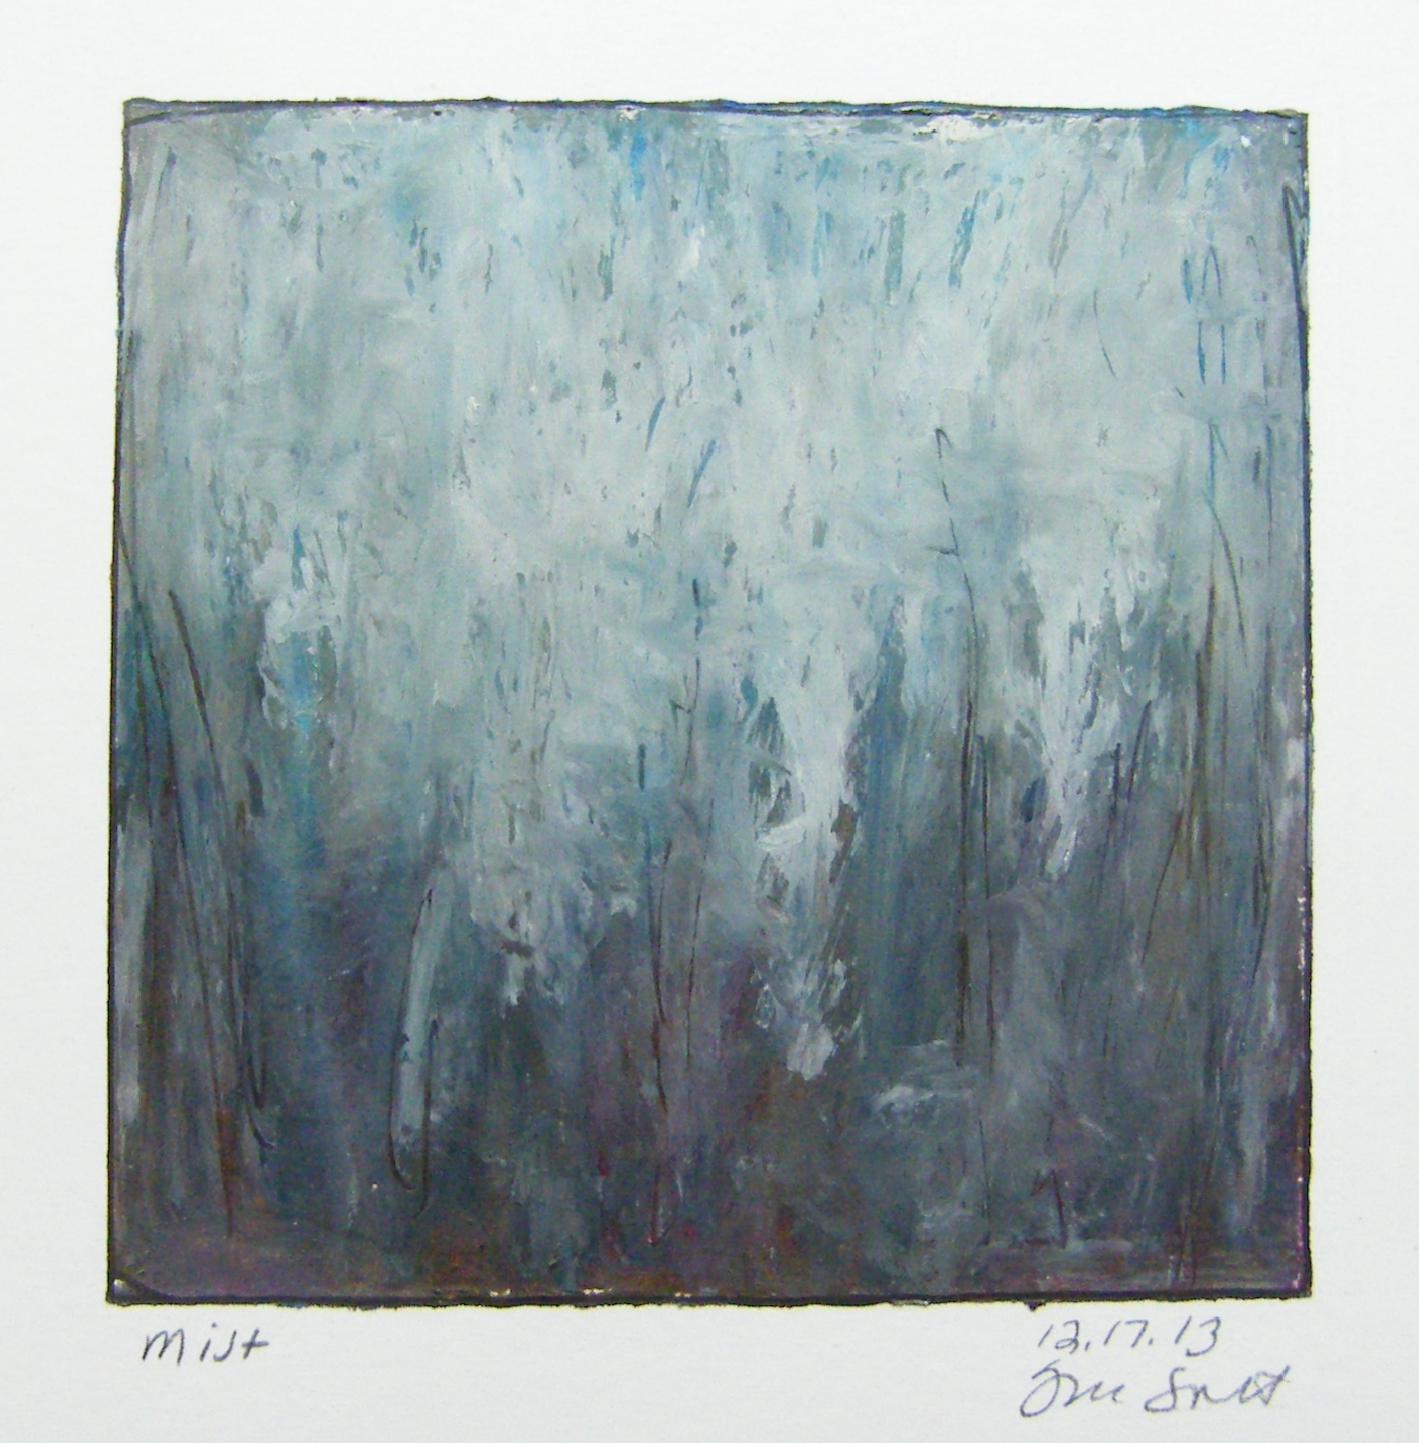 12.17.13 mist